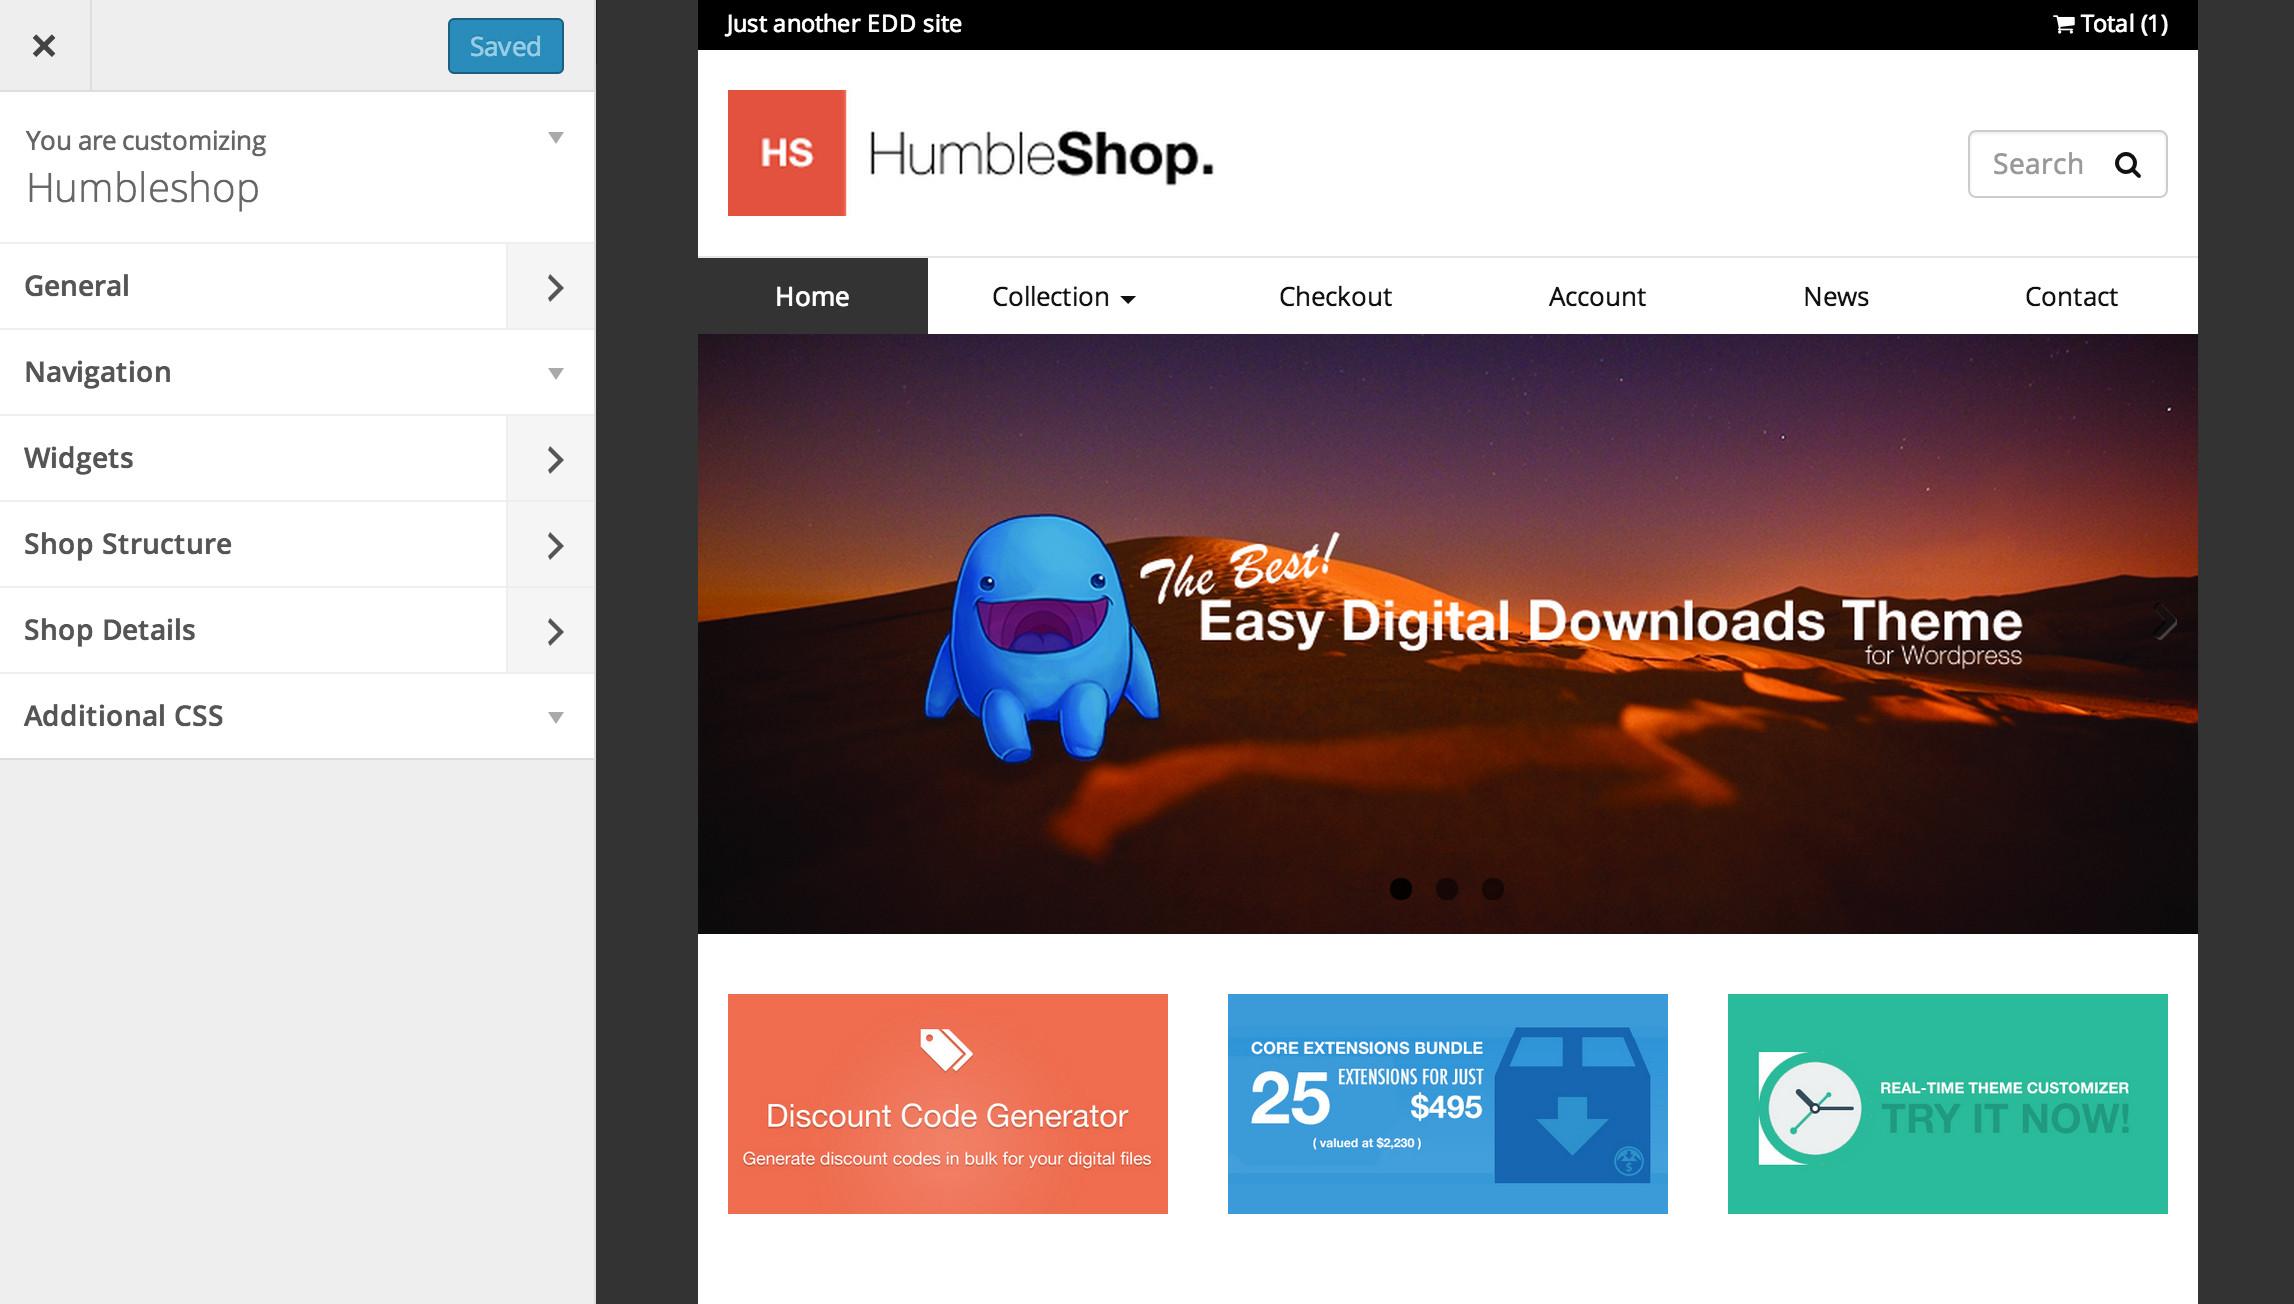 humbleshop3 - Humbleshop - Minimal Easy Digital Downloads Theme